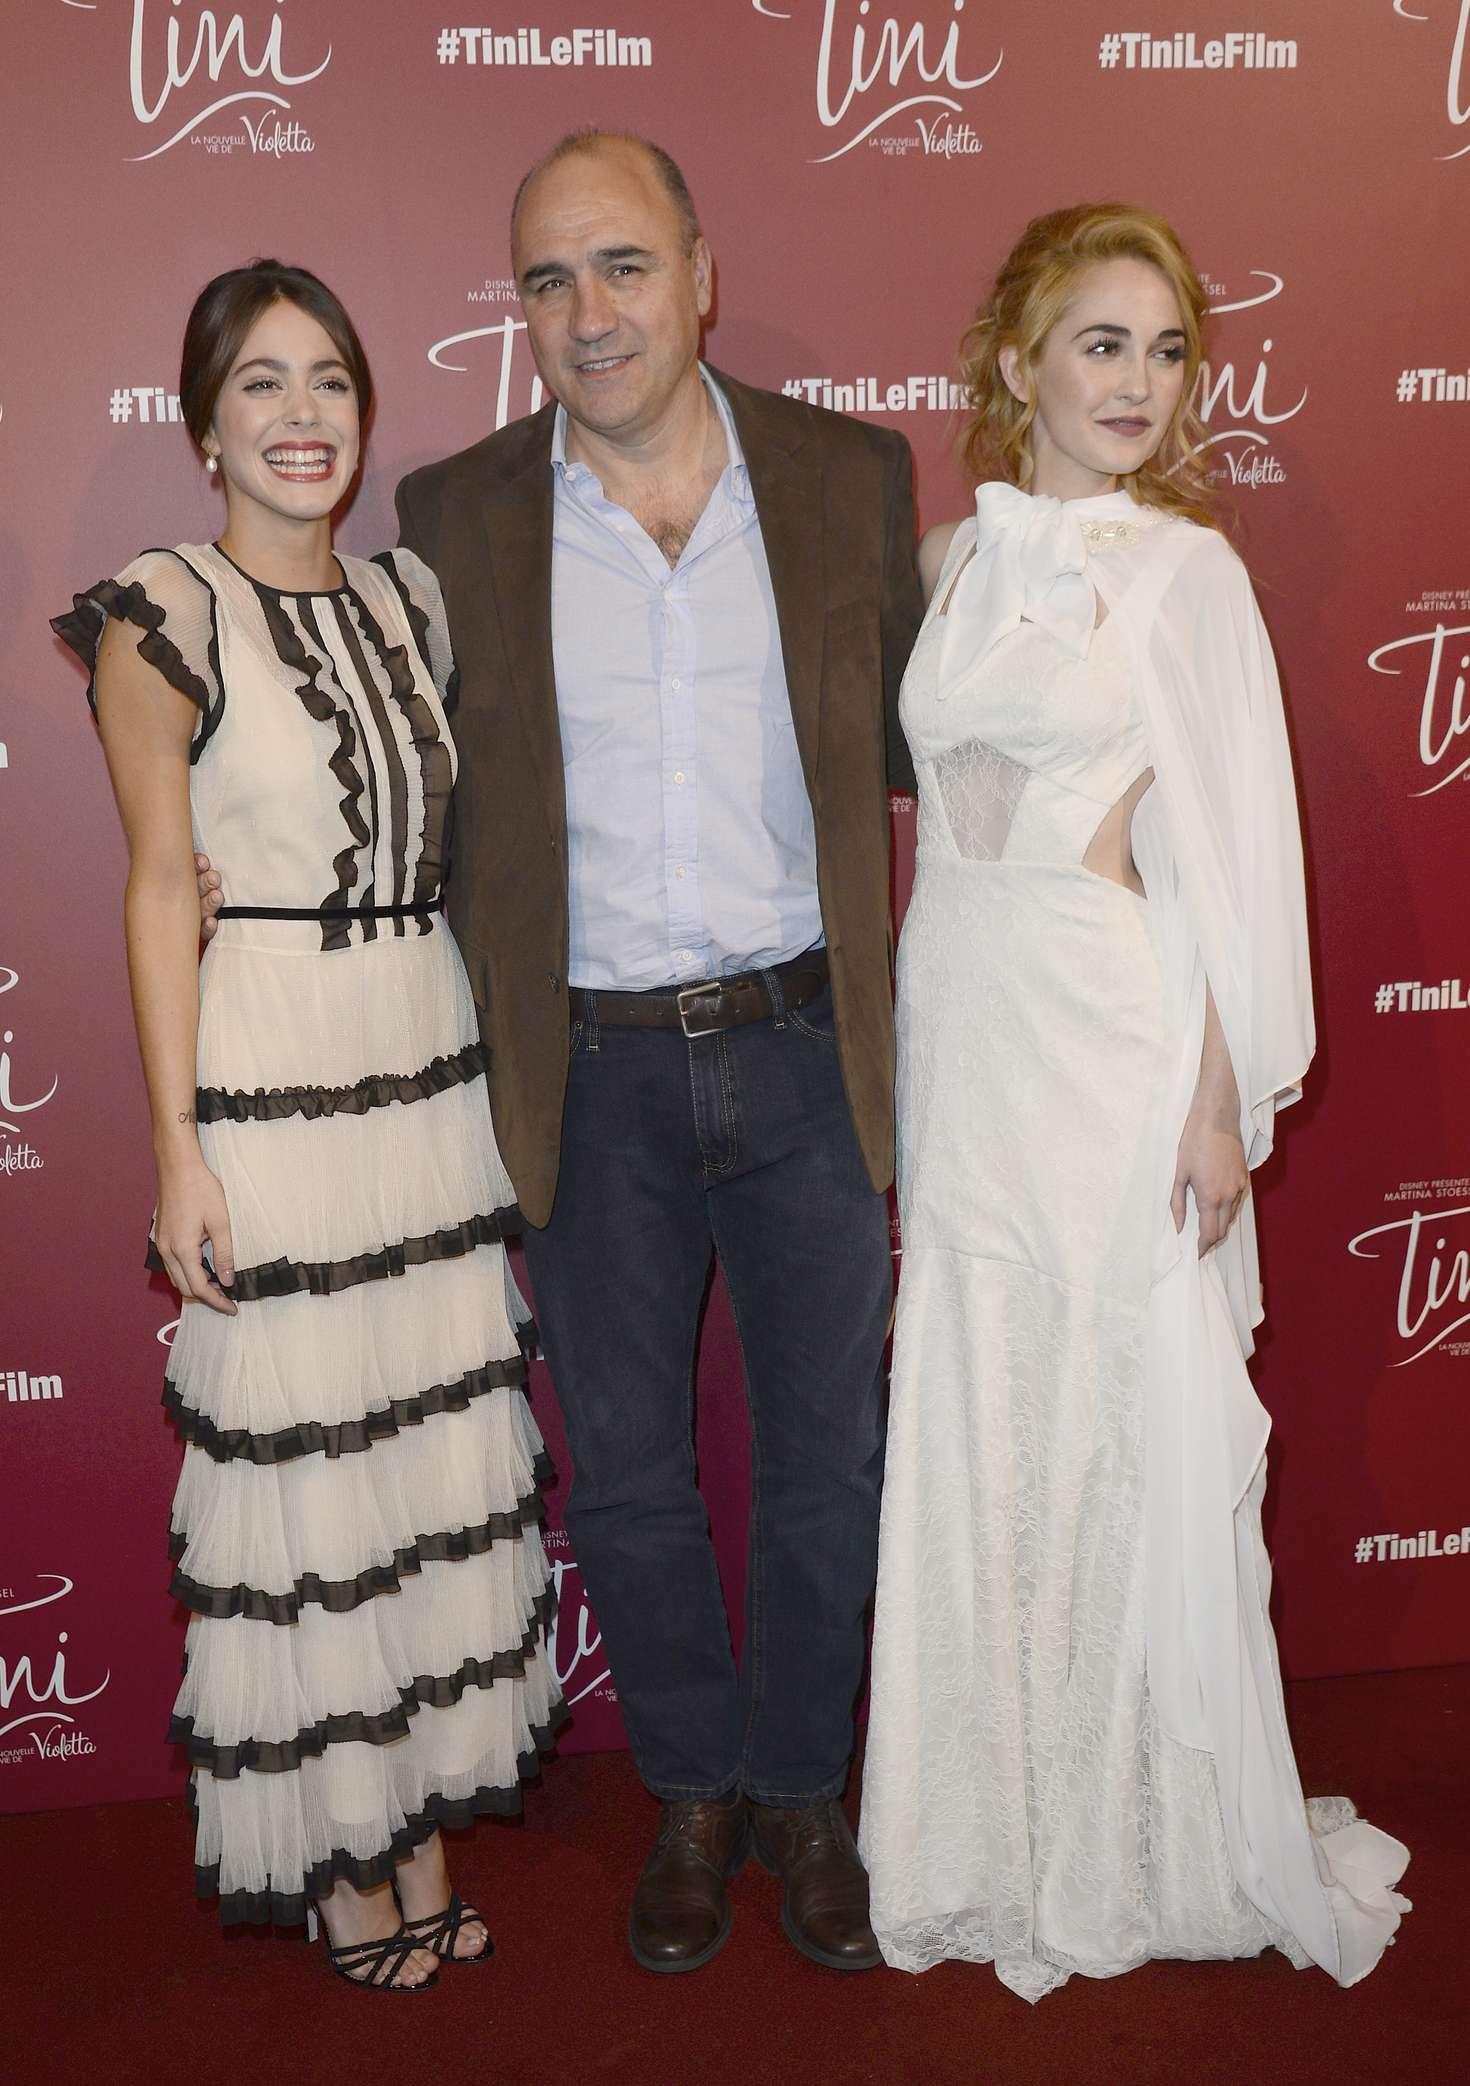 Martina Stoessel and Mercedes Lambre La nouvelle vie de Violetta Premiere in Paris